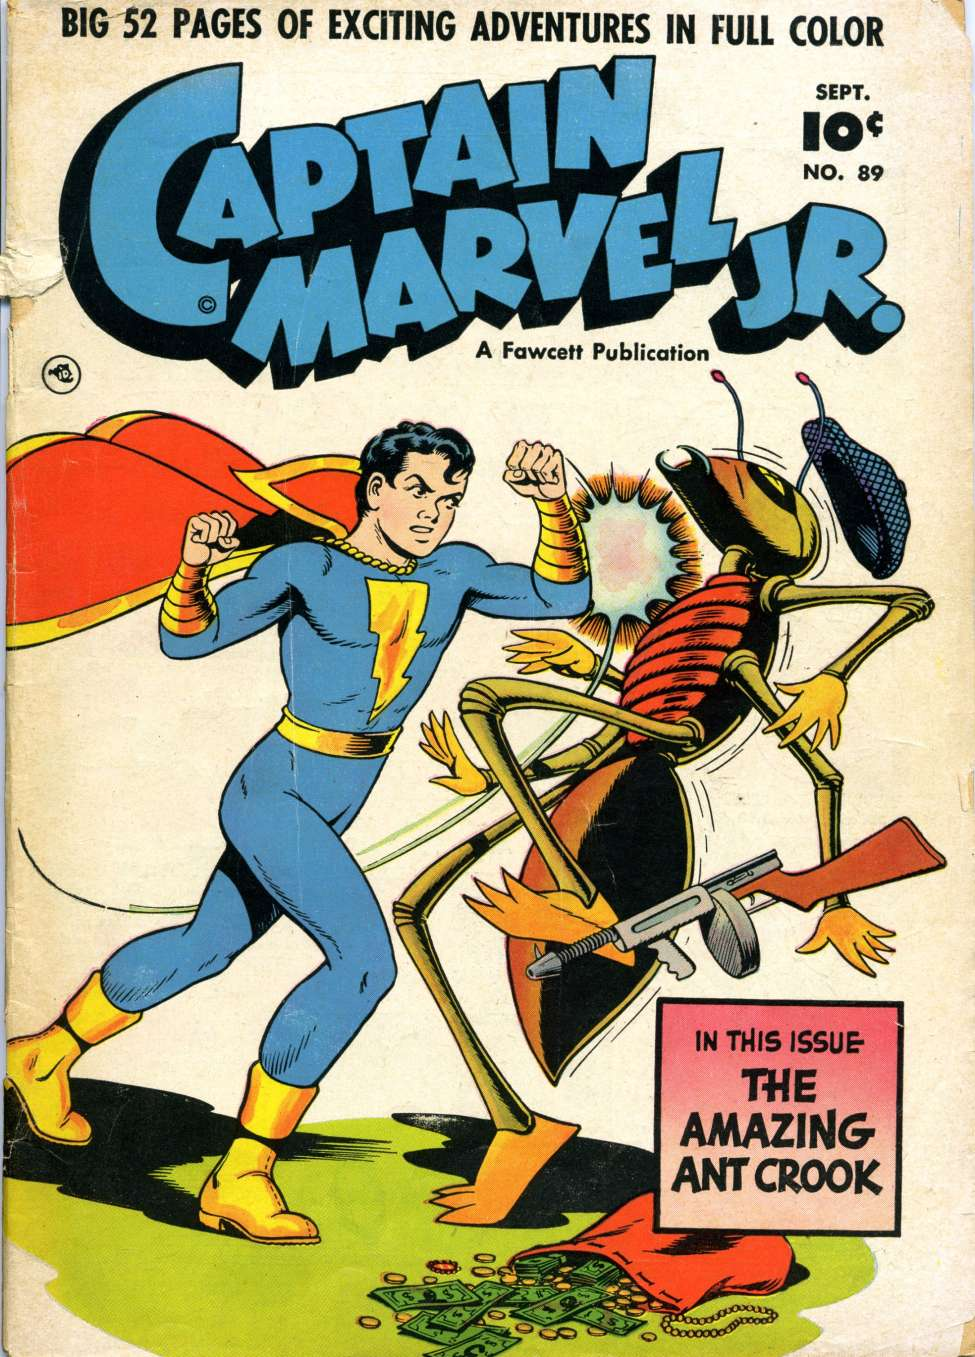 Comic Book Cover For Captain Marvel Jr. #89